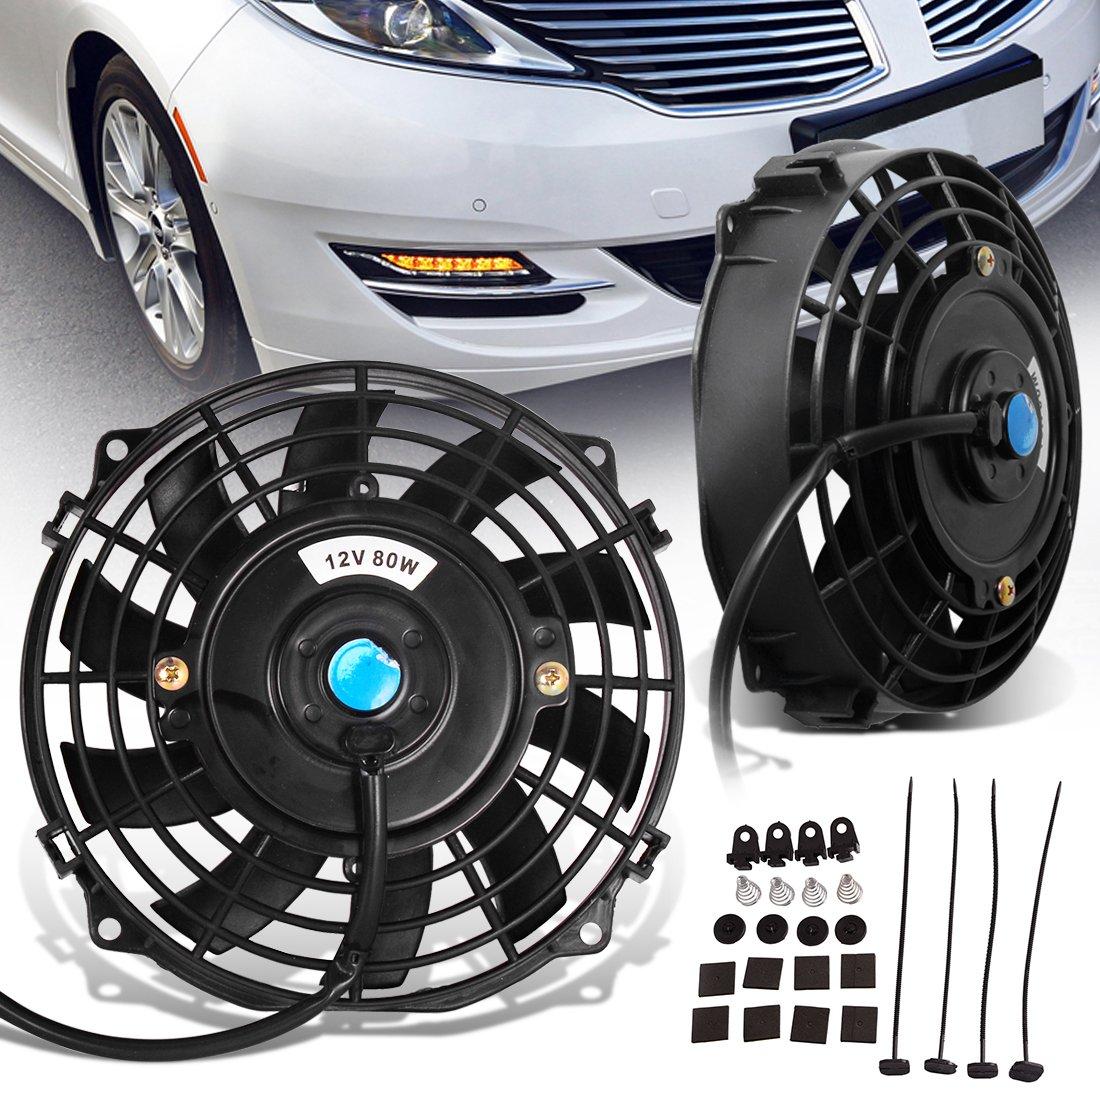 Auto Car Electric Radiator Cooling Cooler Fan Mount Fitting Kit Slim Line Set